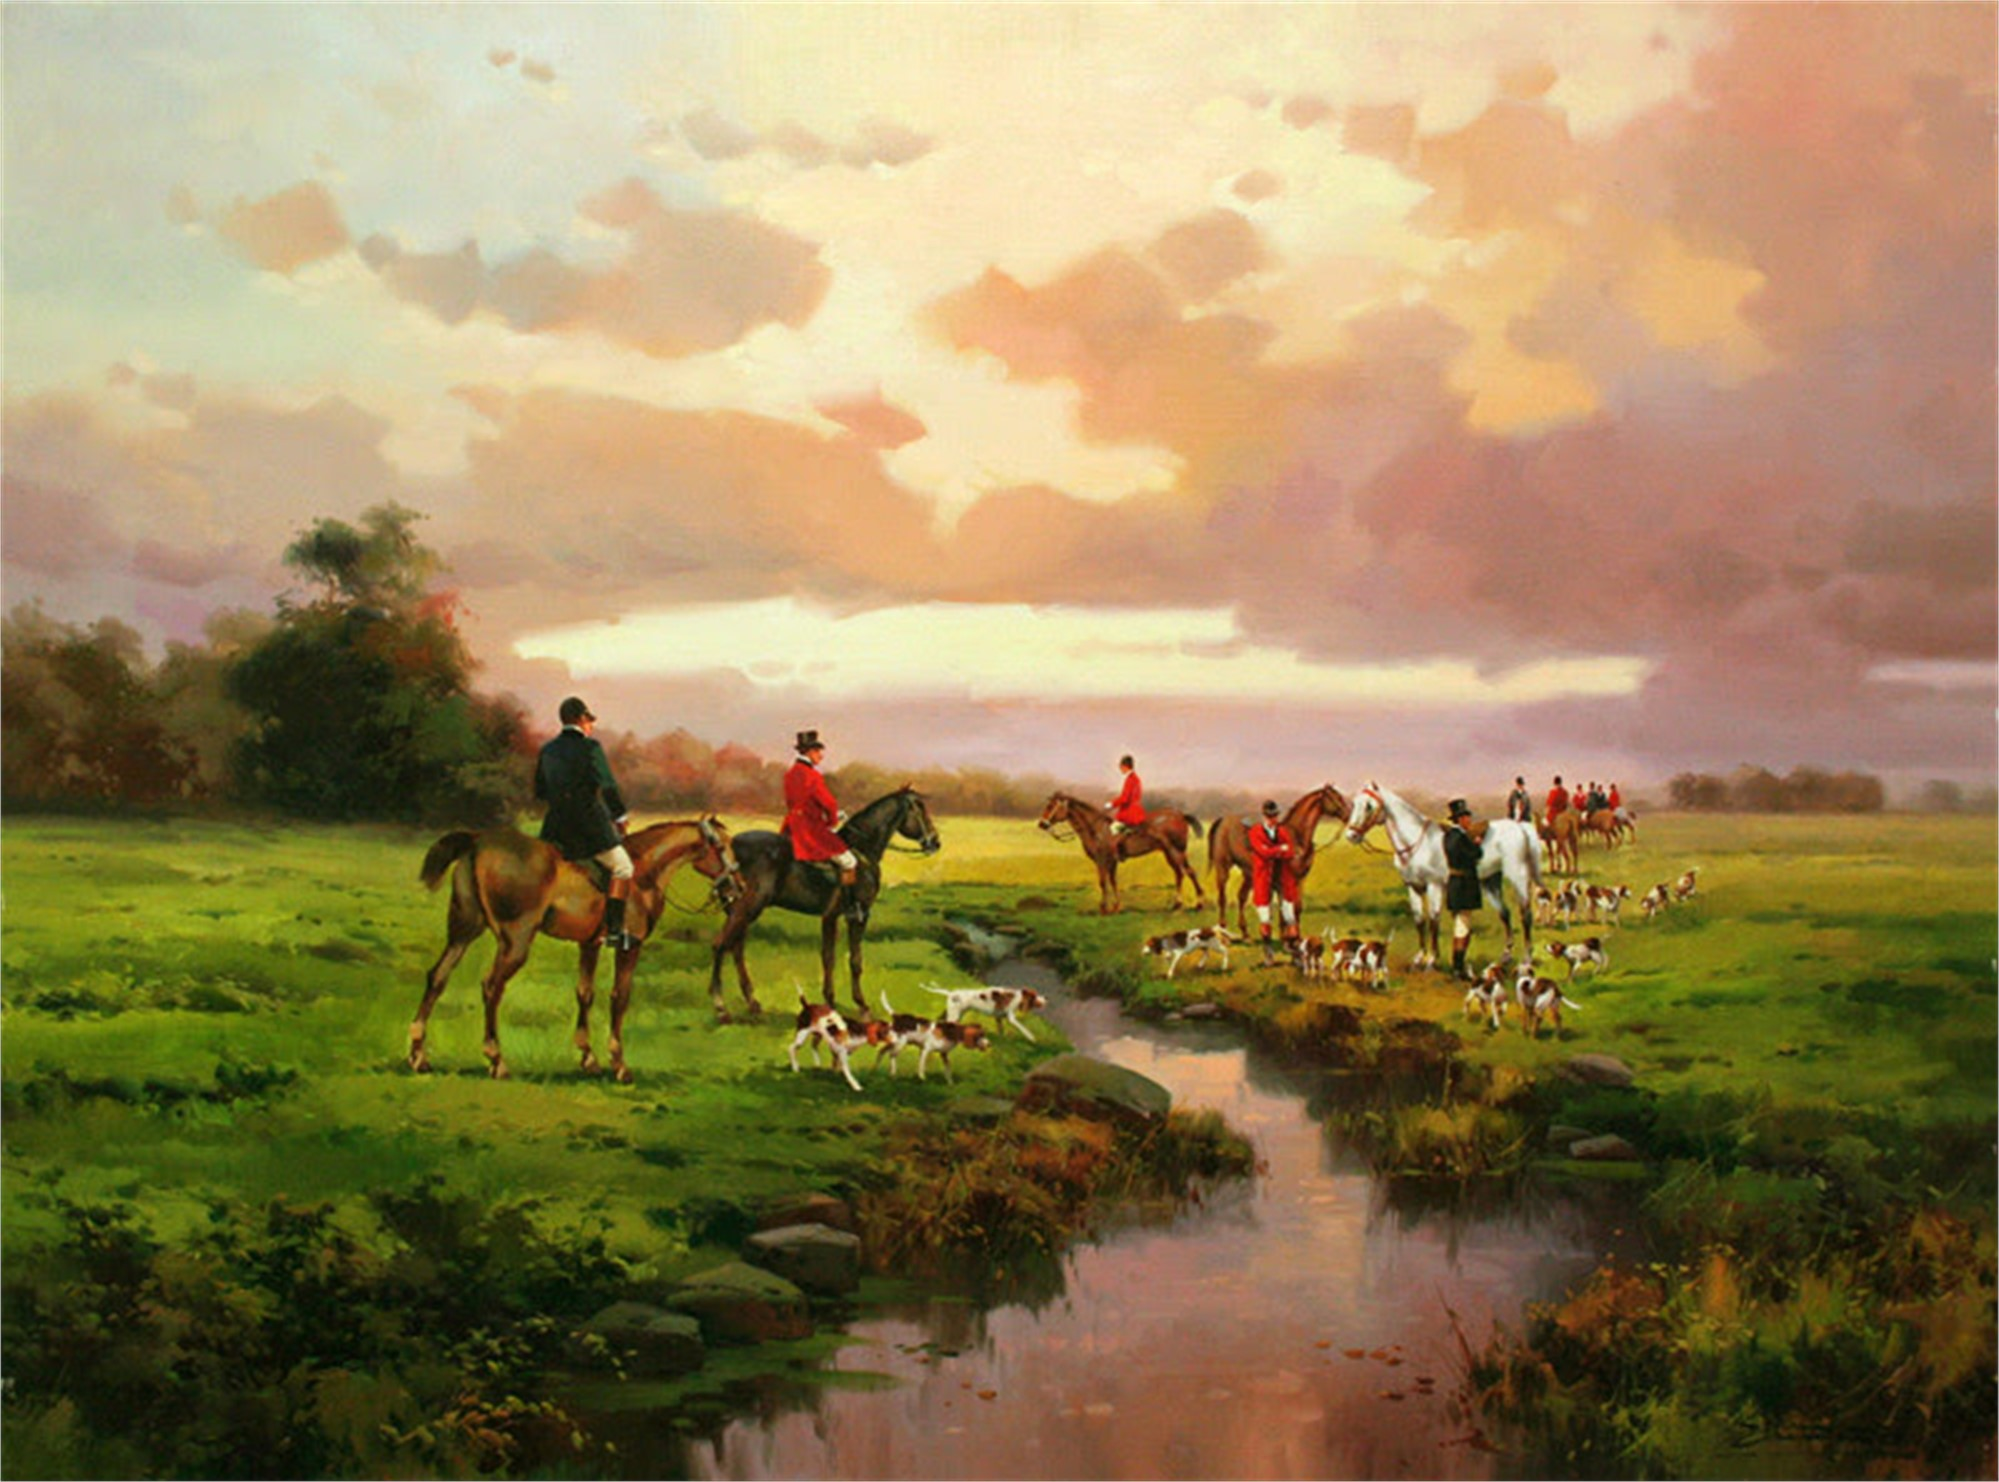 Monteria (Hunting) by Salvador Caballero